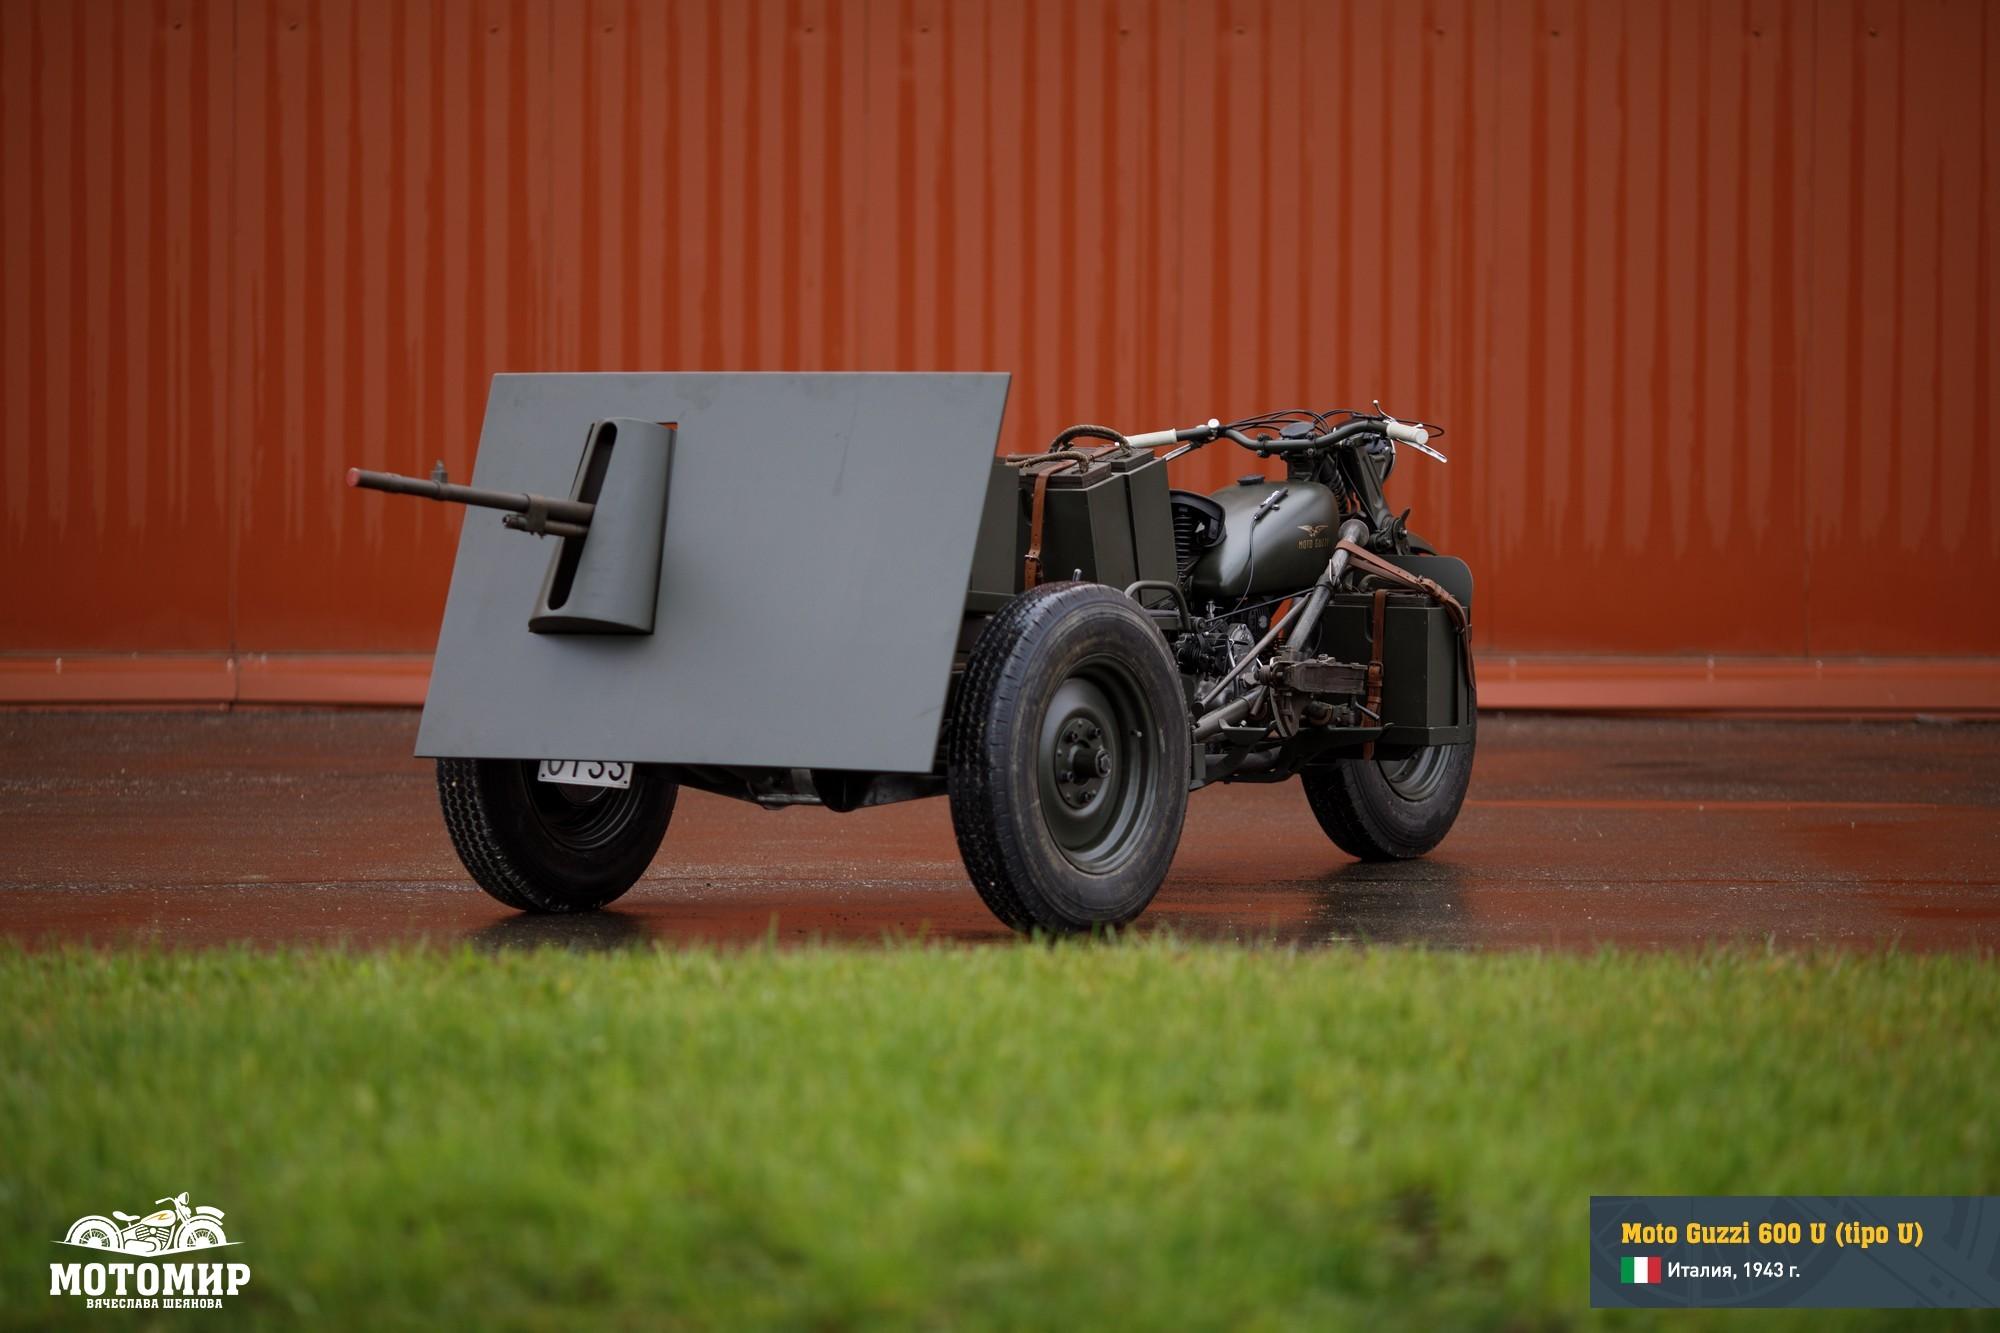 moto-guzzi-600-u-web-05